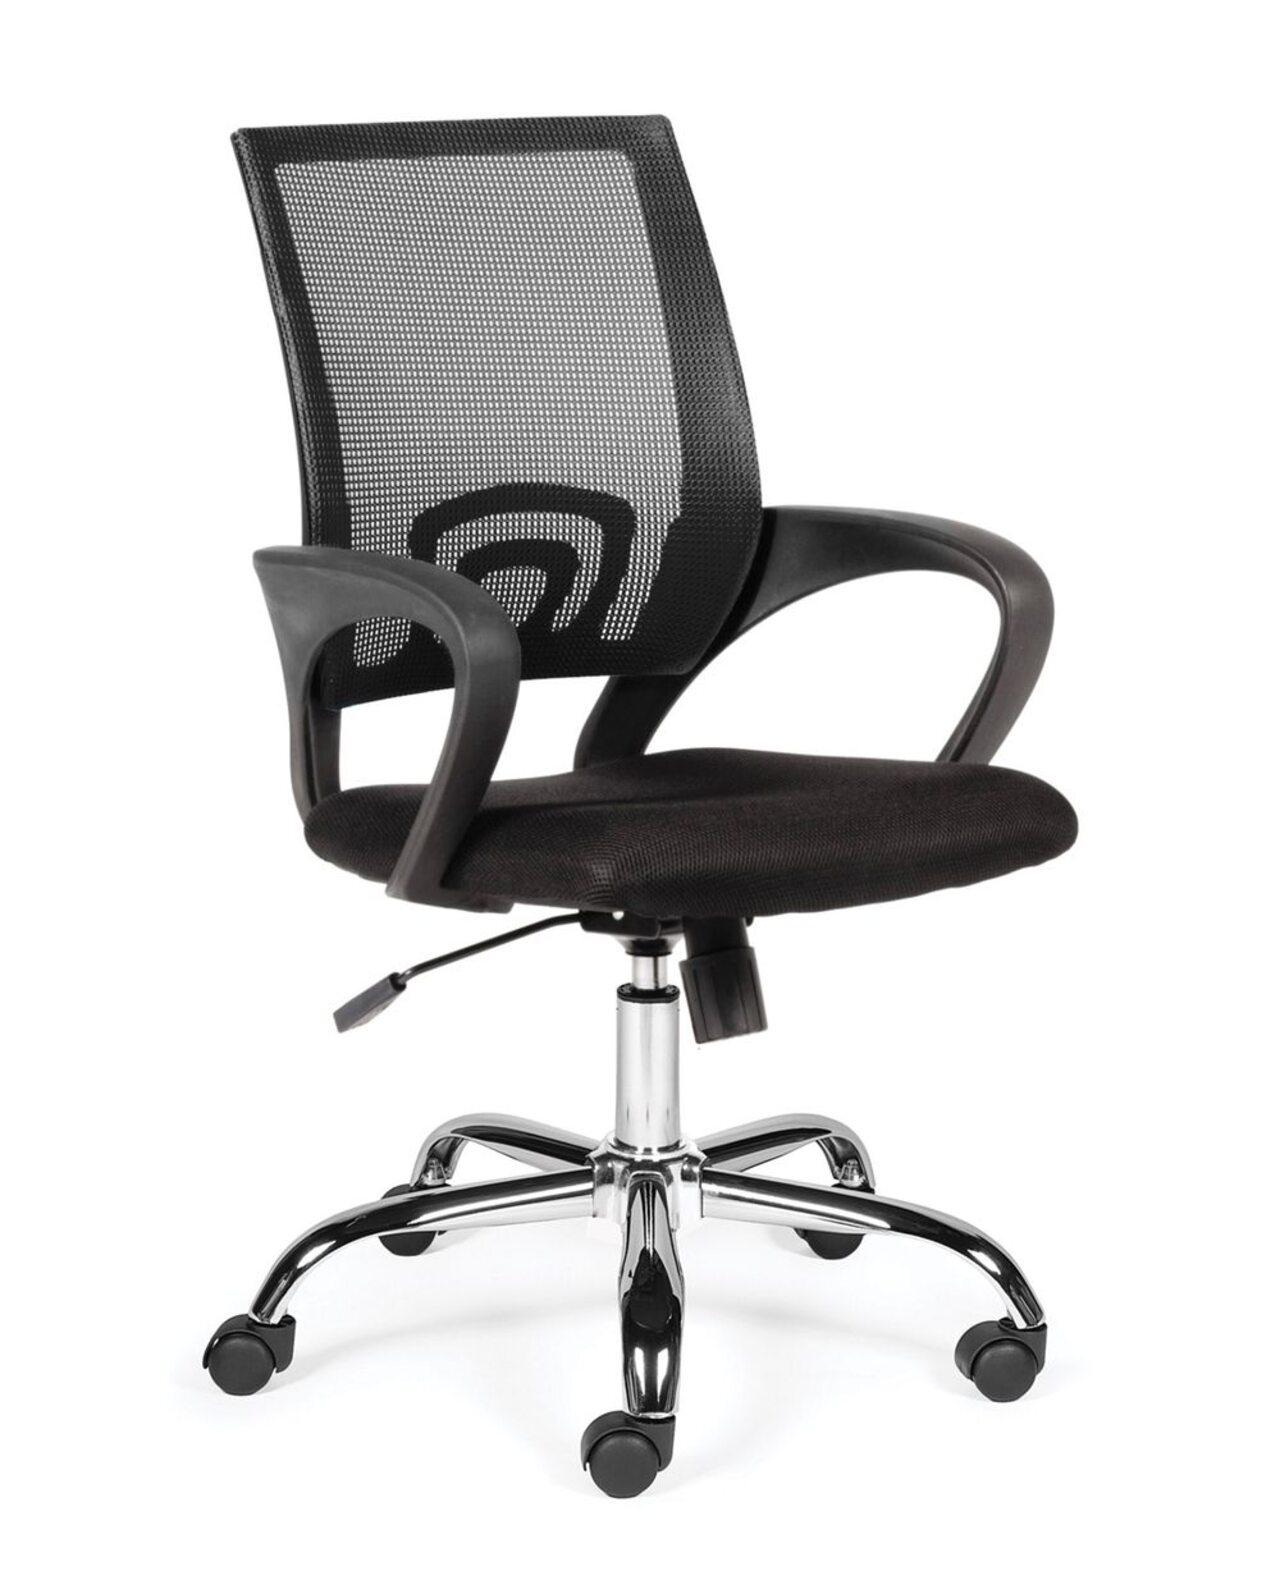 Кресло офисное Спринг 804-1 chrome  - фото 3